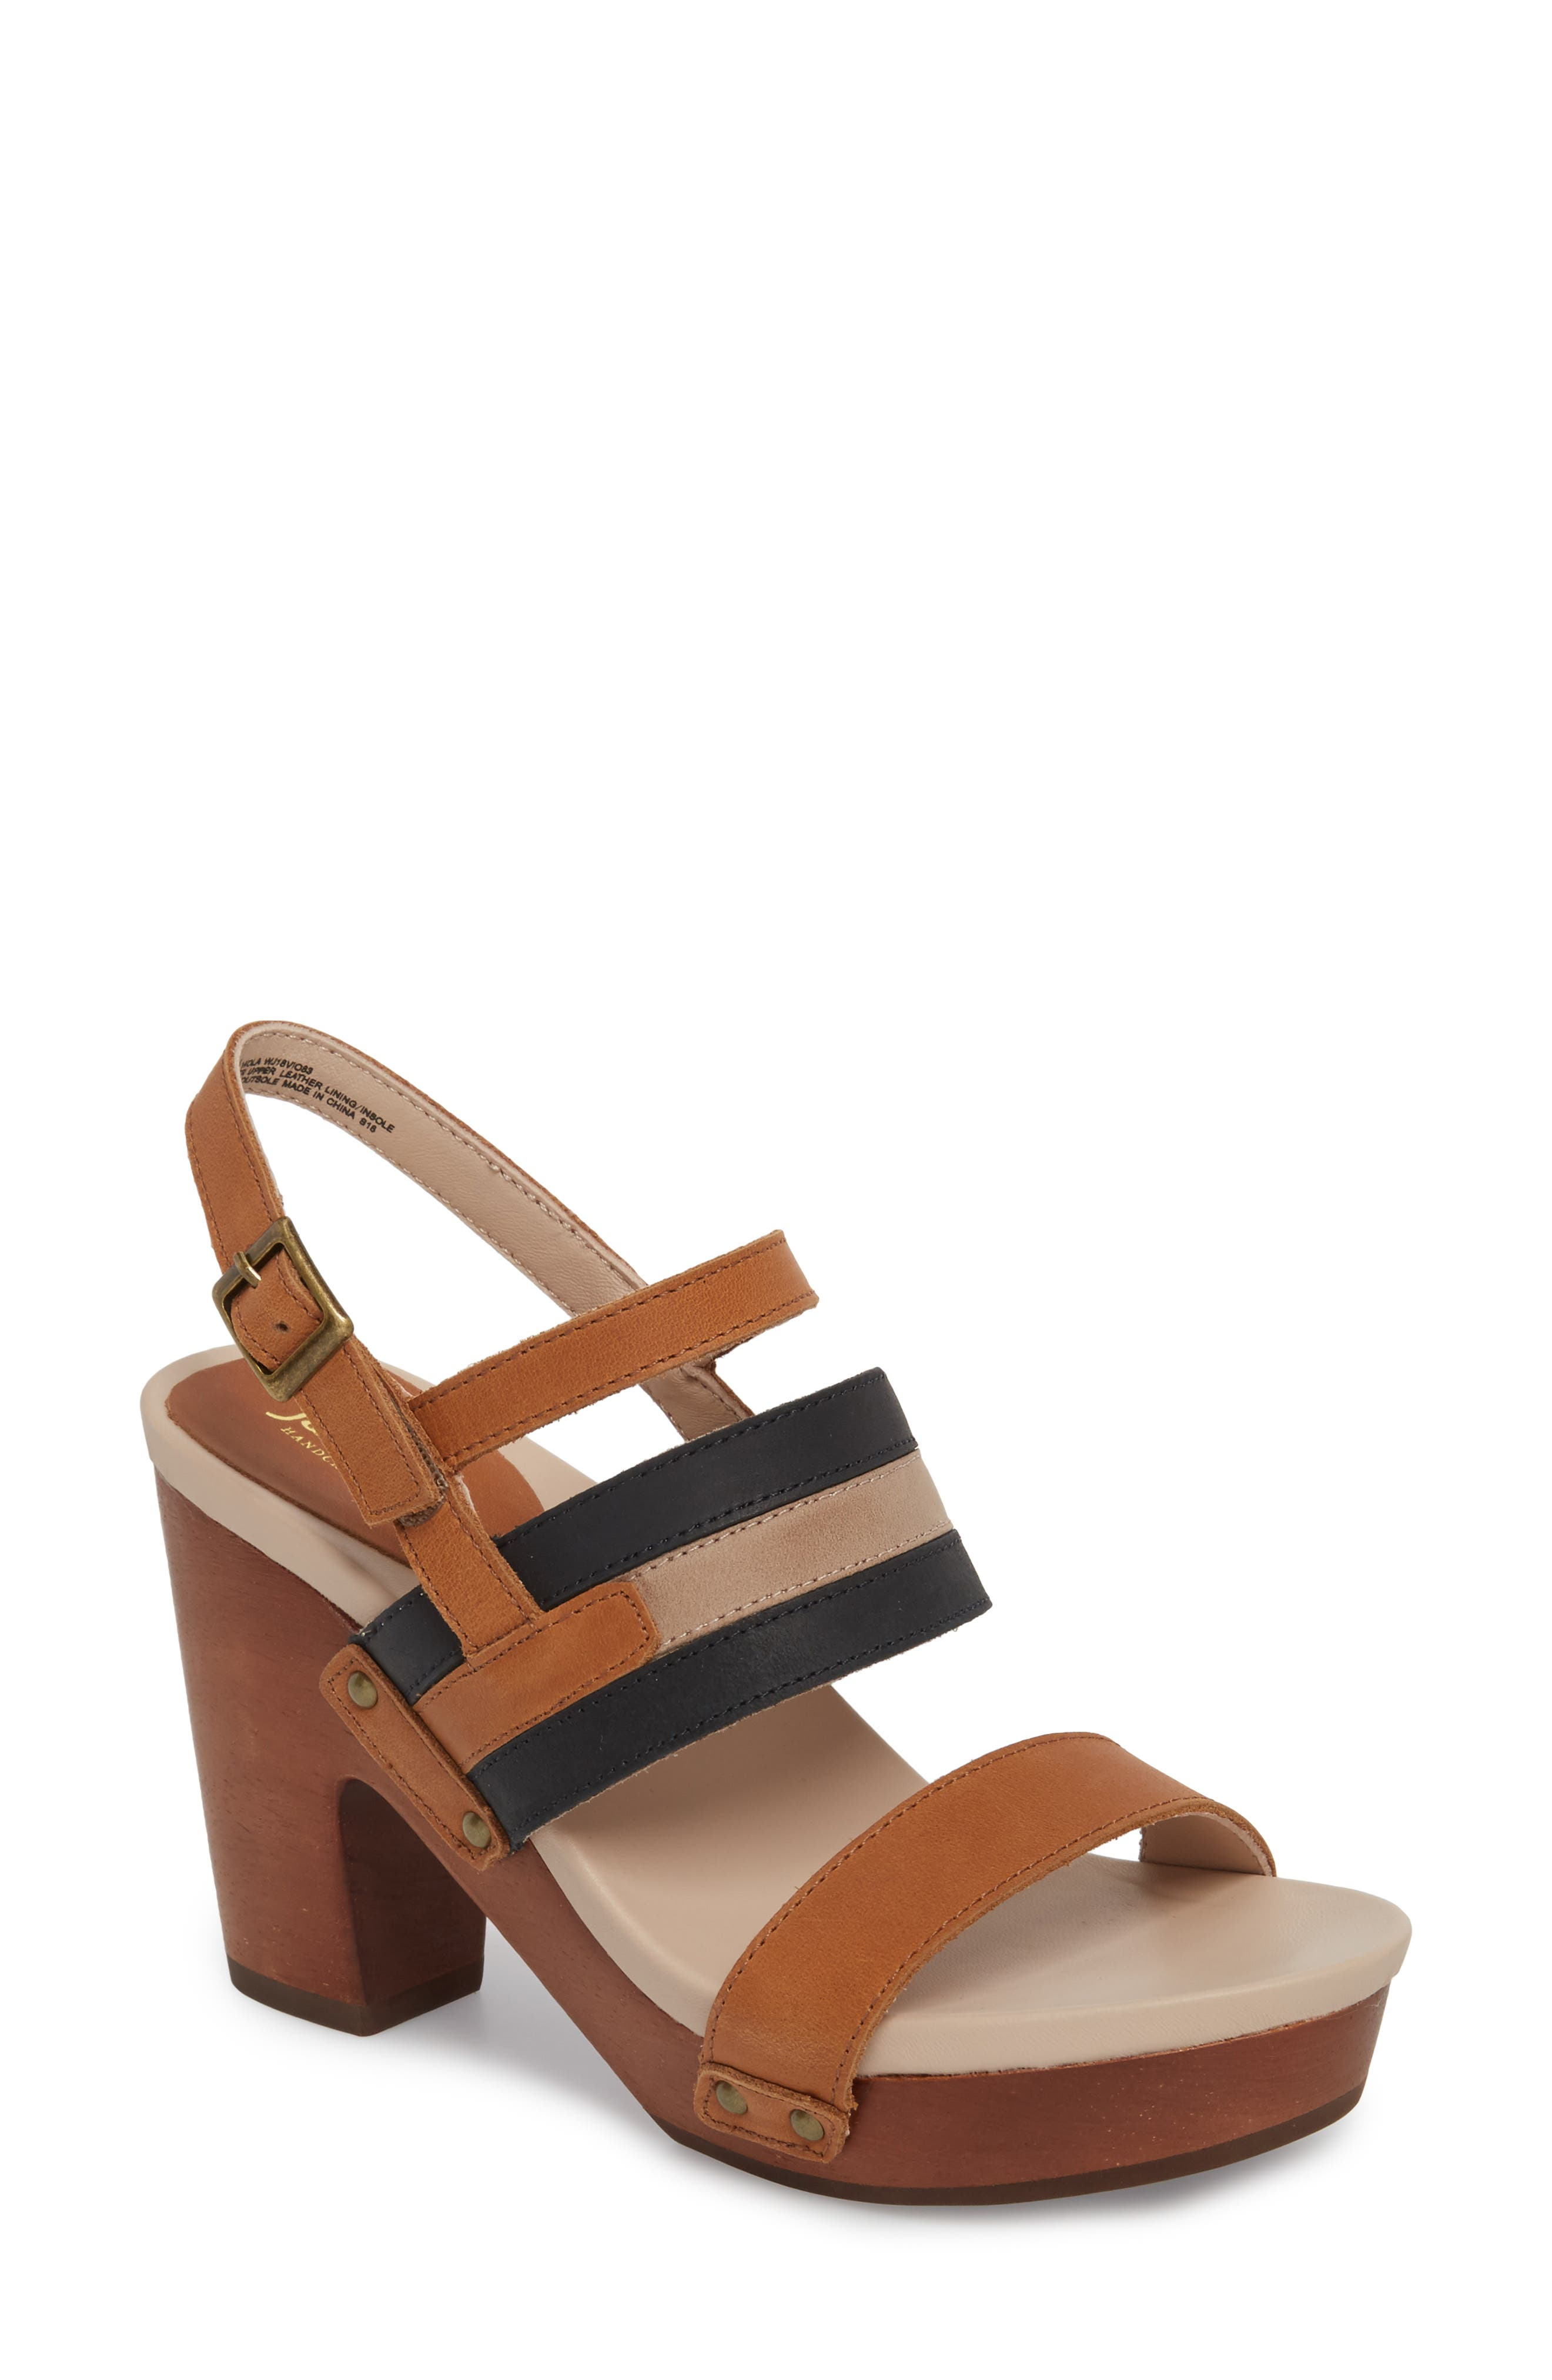 Viola Platform Sandal,                             Main thumbnail 1, color,                             200